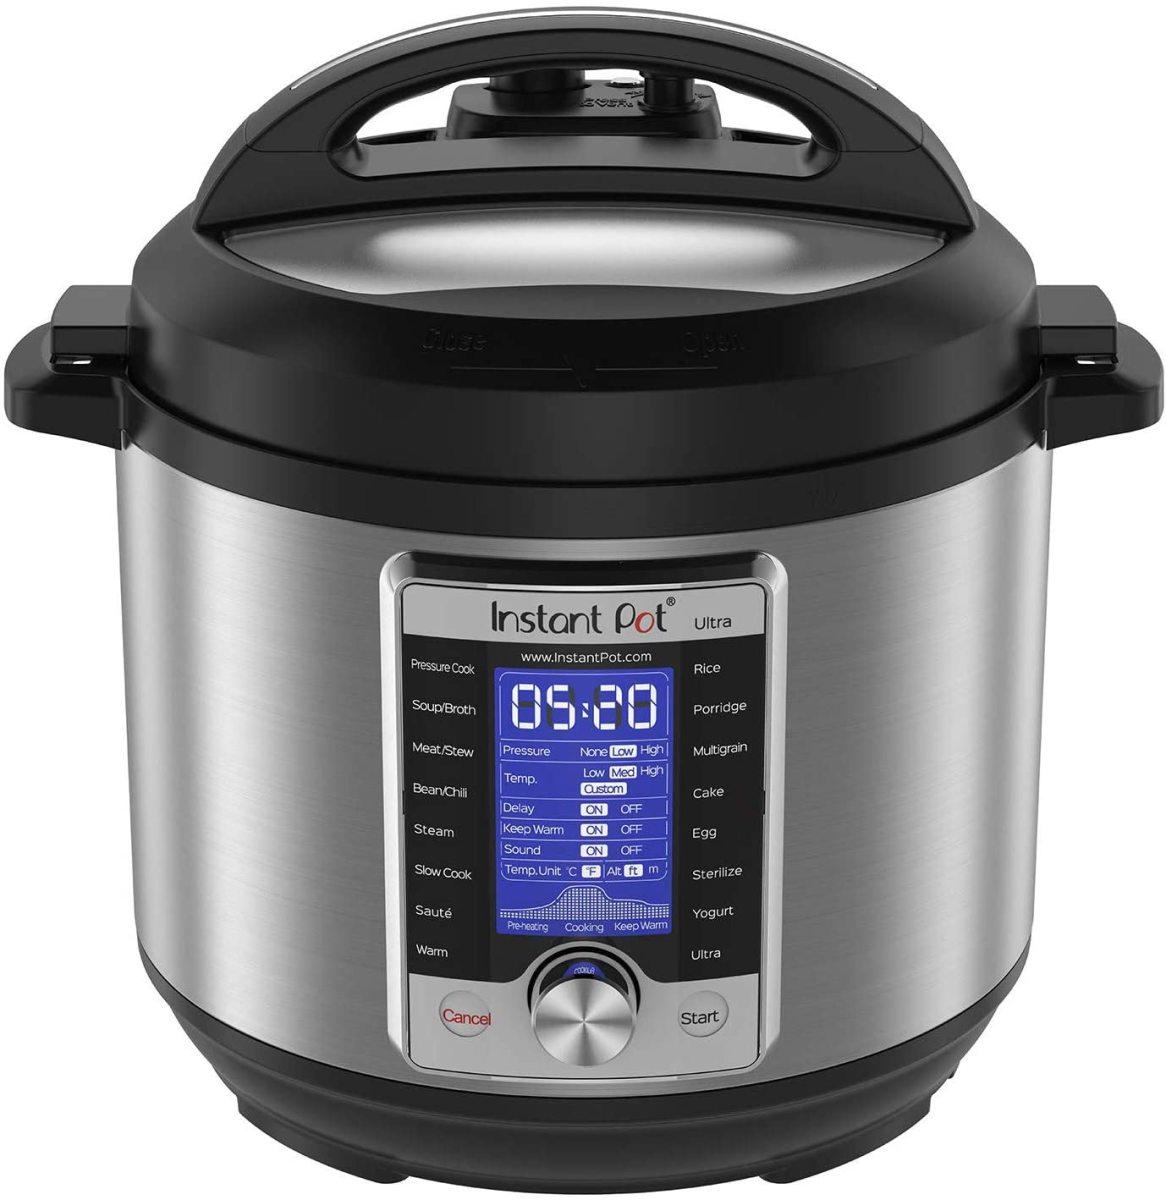 The Instant Pot Ultra 60 Ultra 6 Qt 10-in-1 Multi- Use